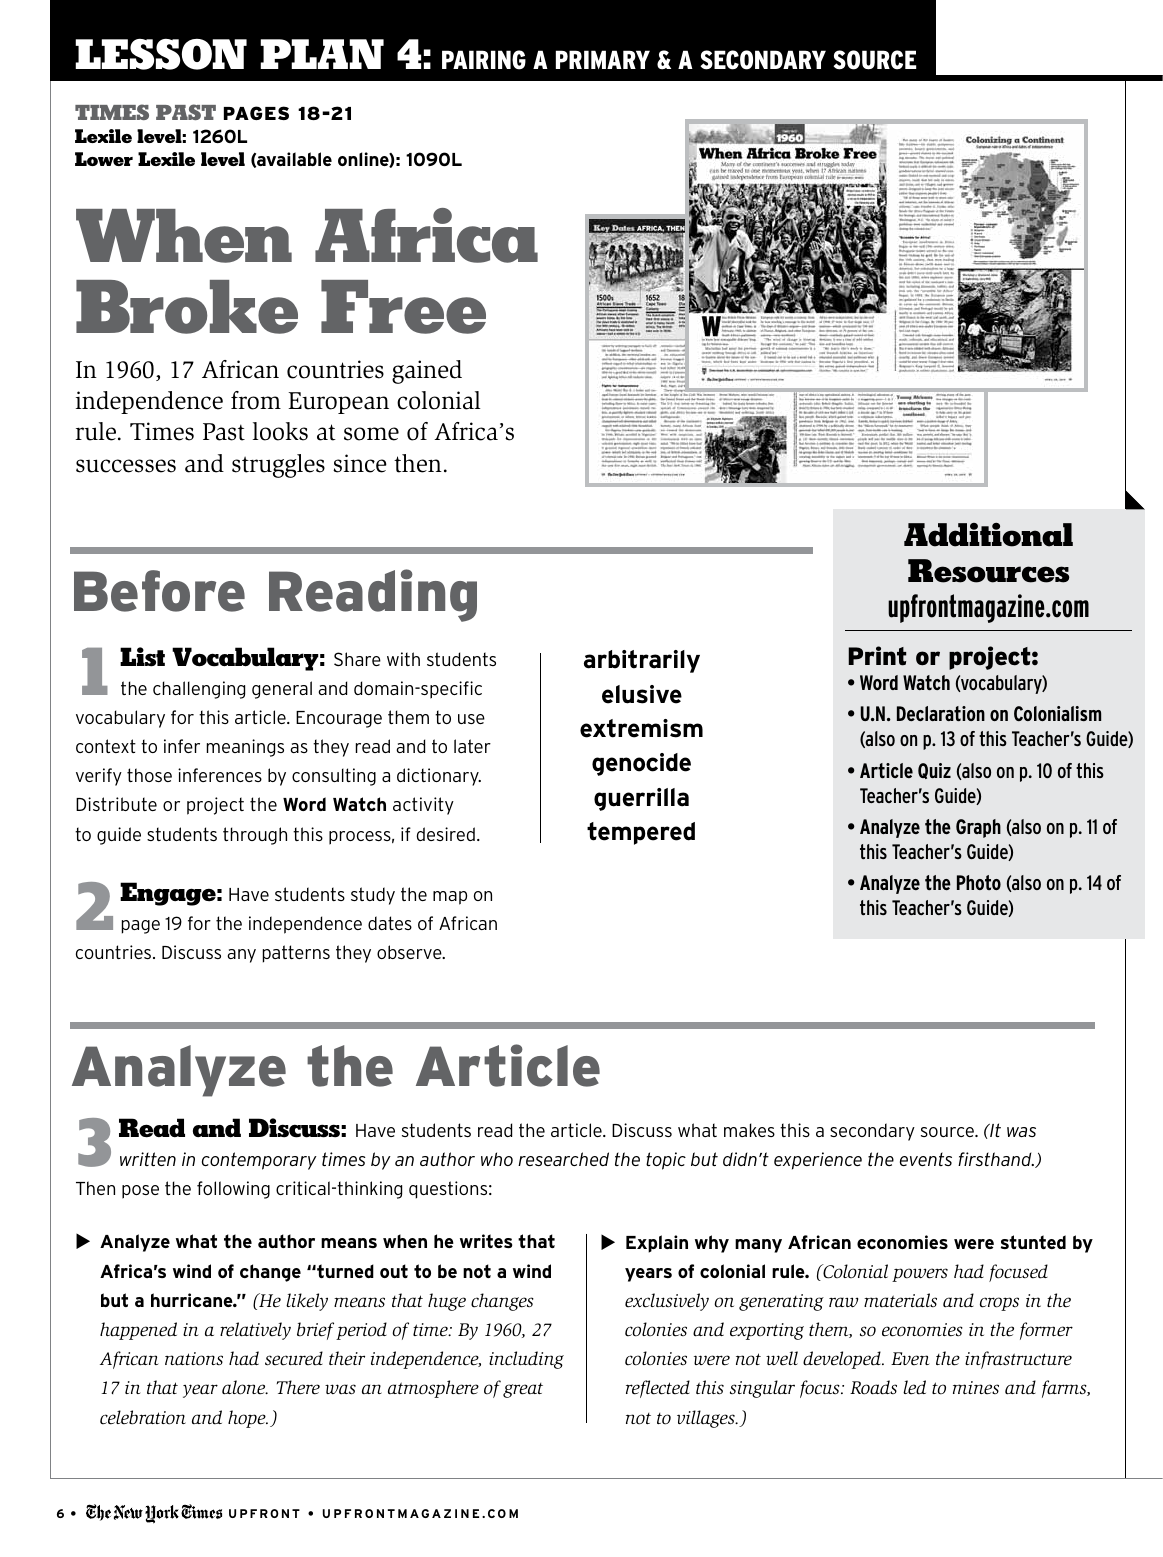 When Africa Broke Free